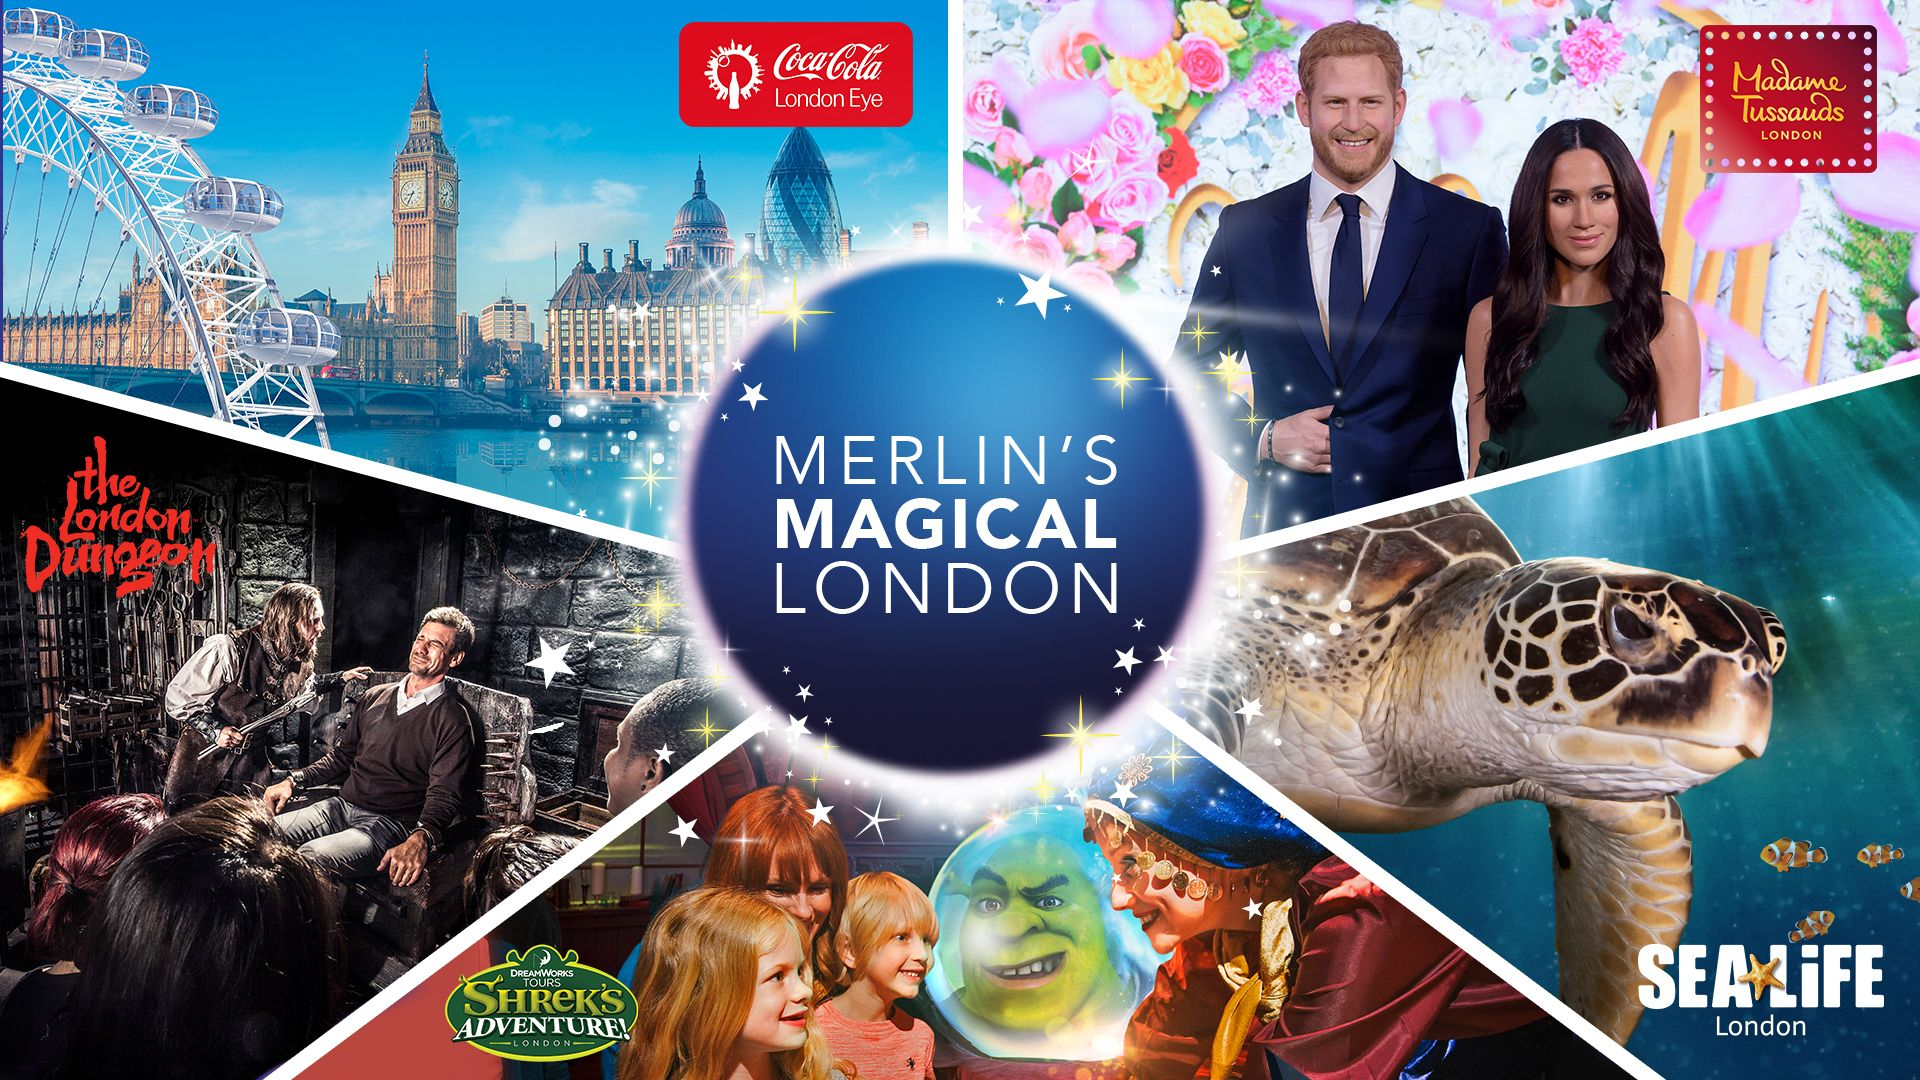 Merlin's Magical London (hero) - (1920x1080)px.jpg